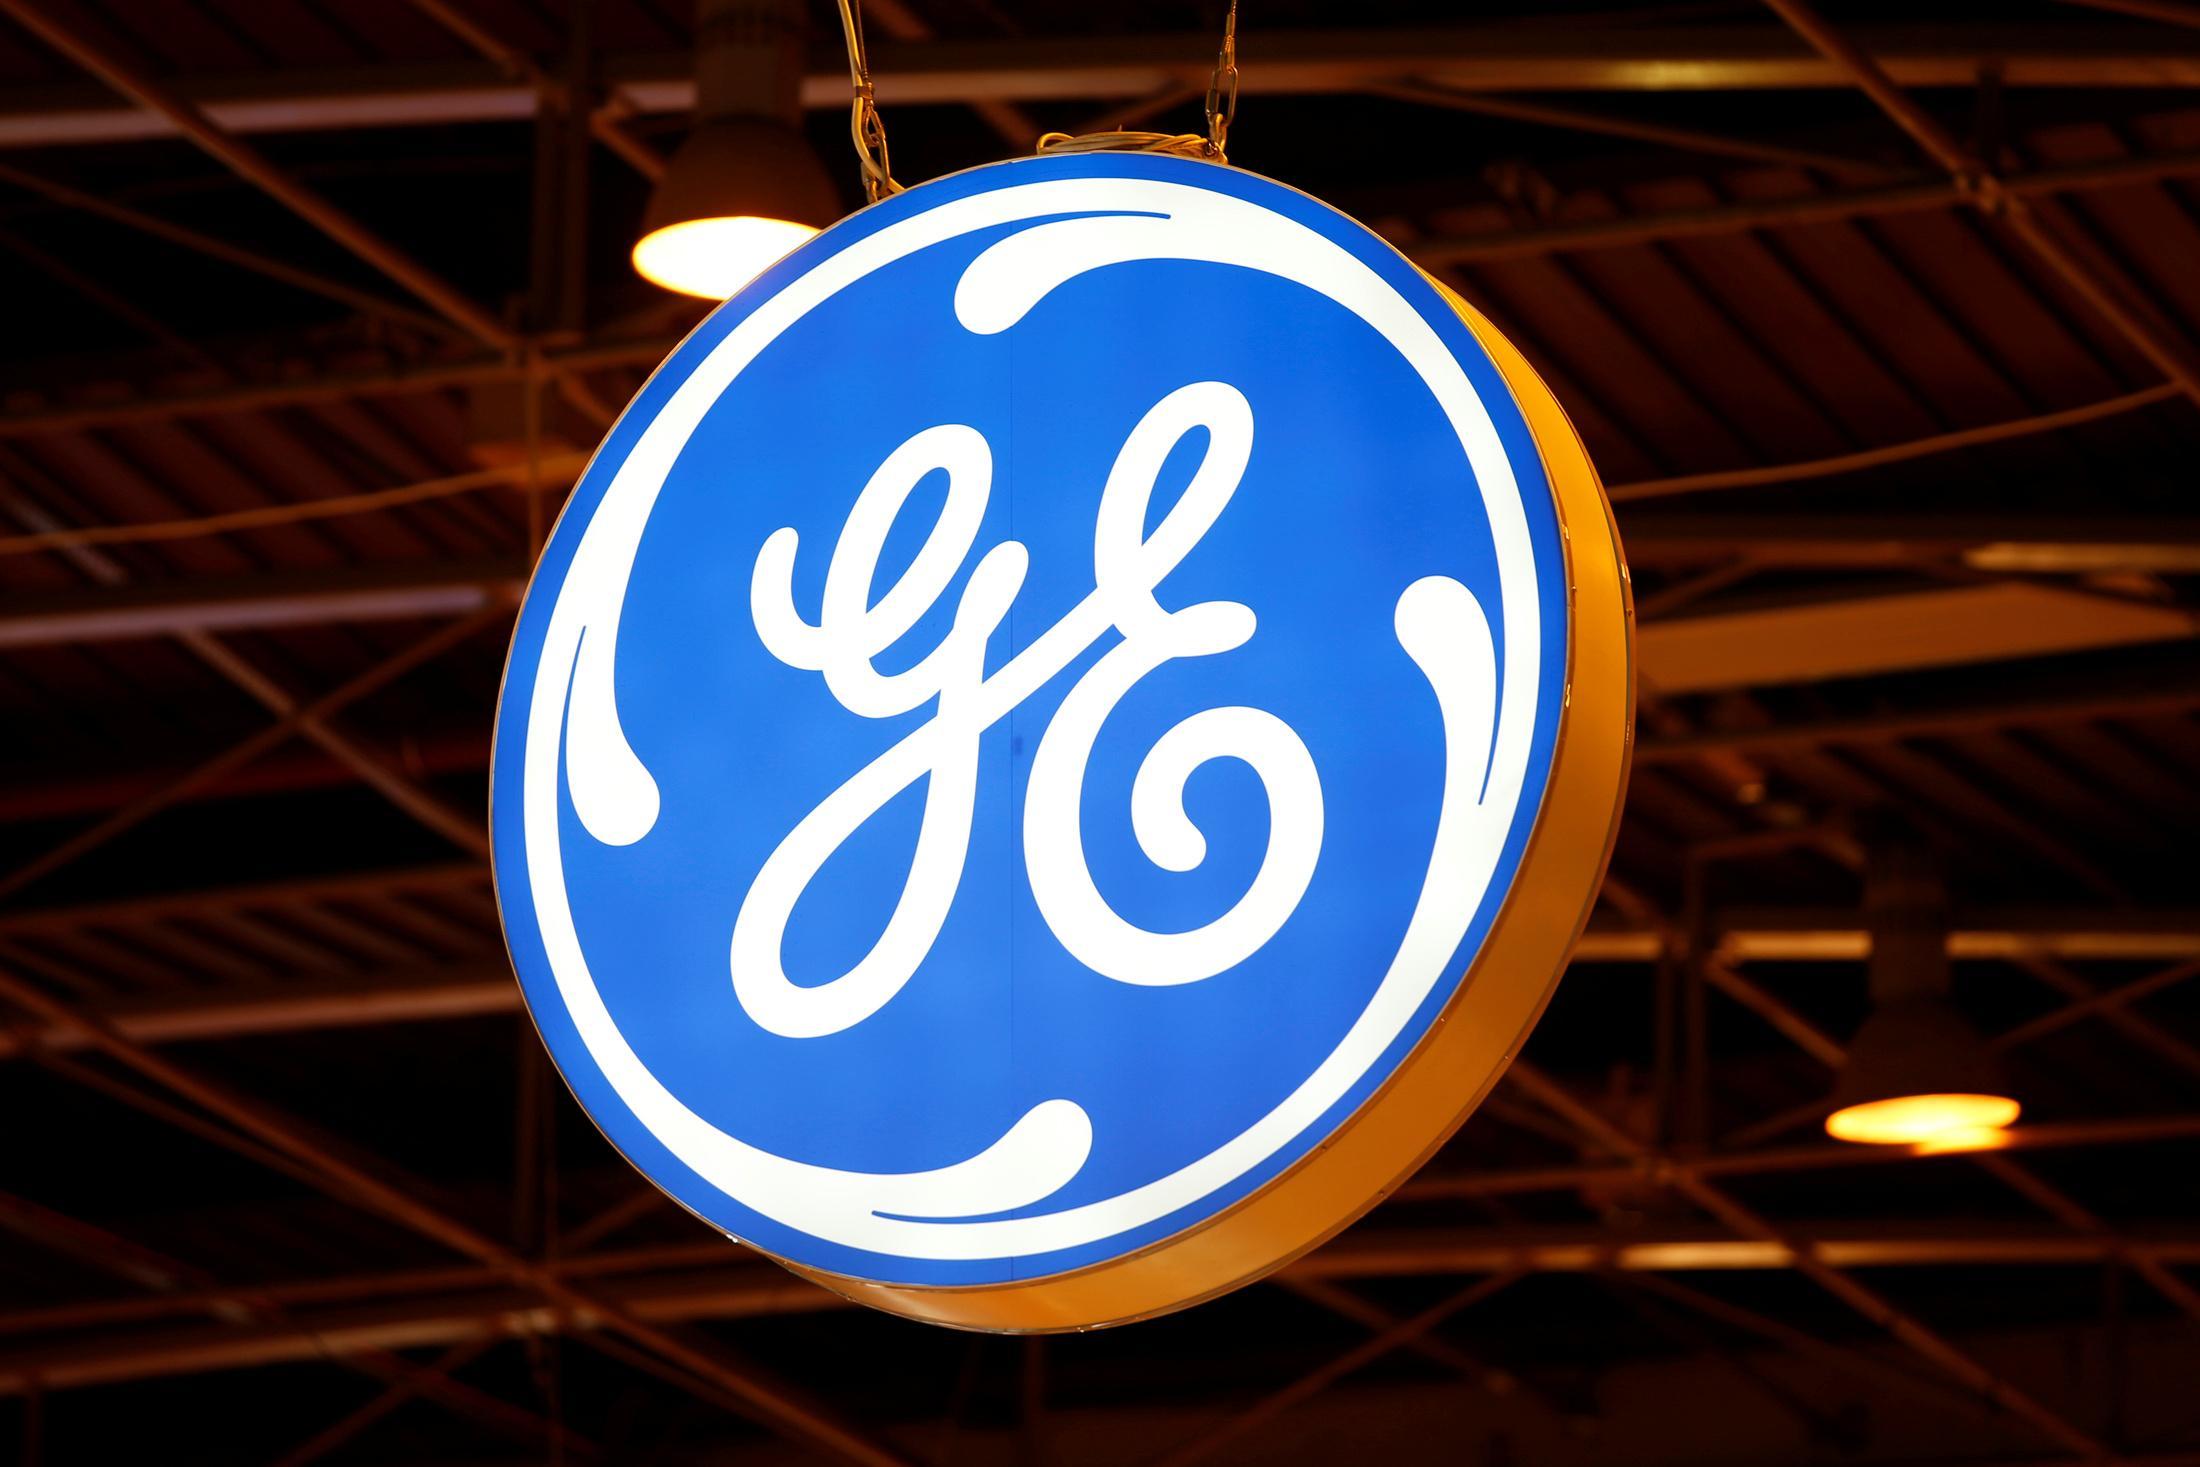 General Electric will keine Kohlekraftwerke mehr bauen